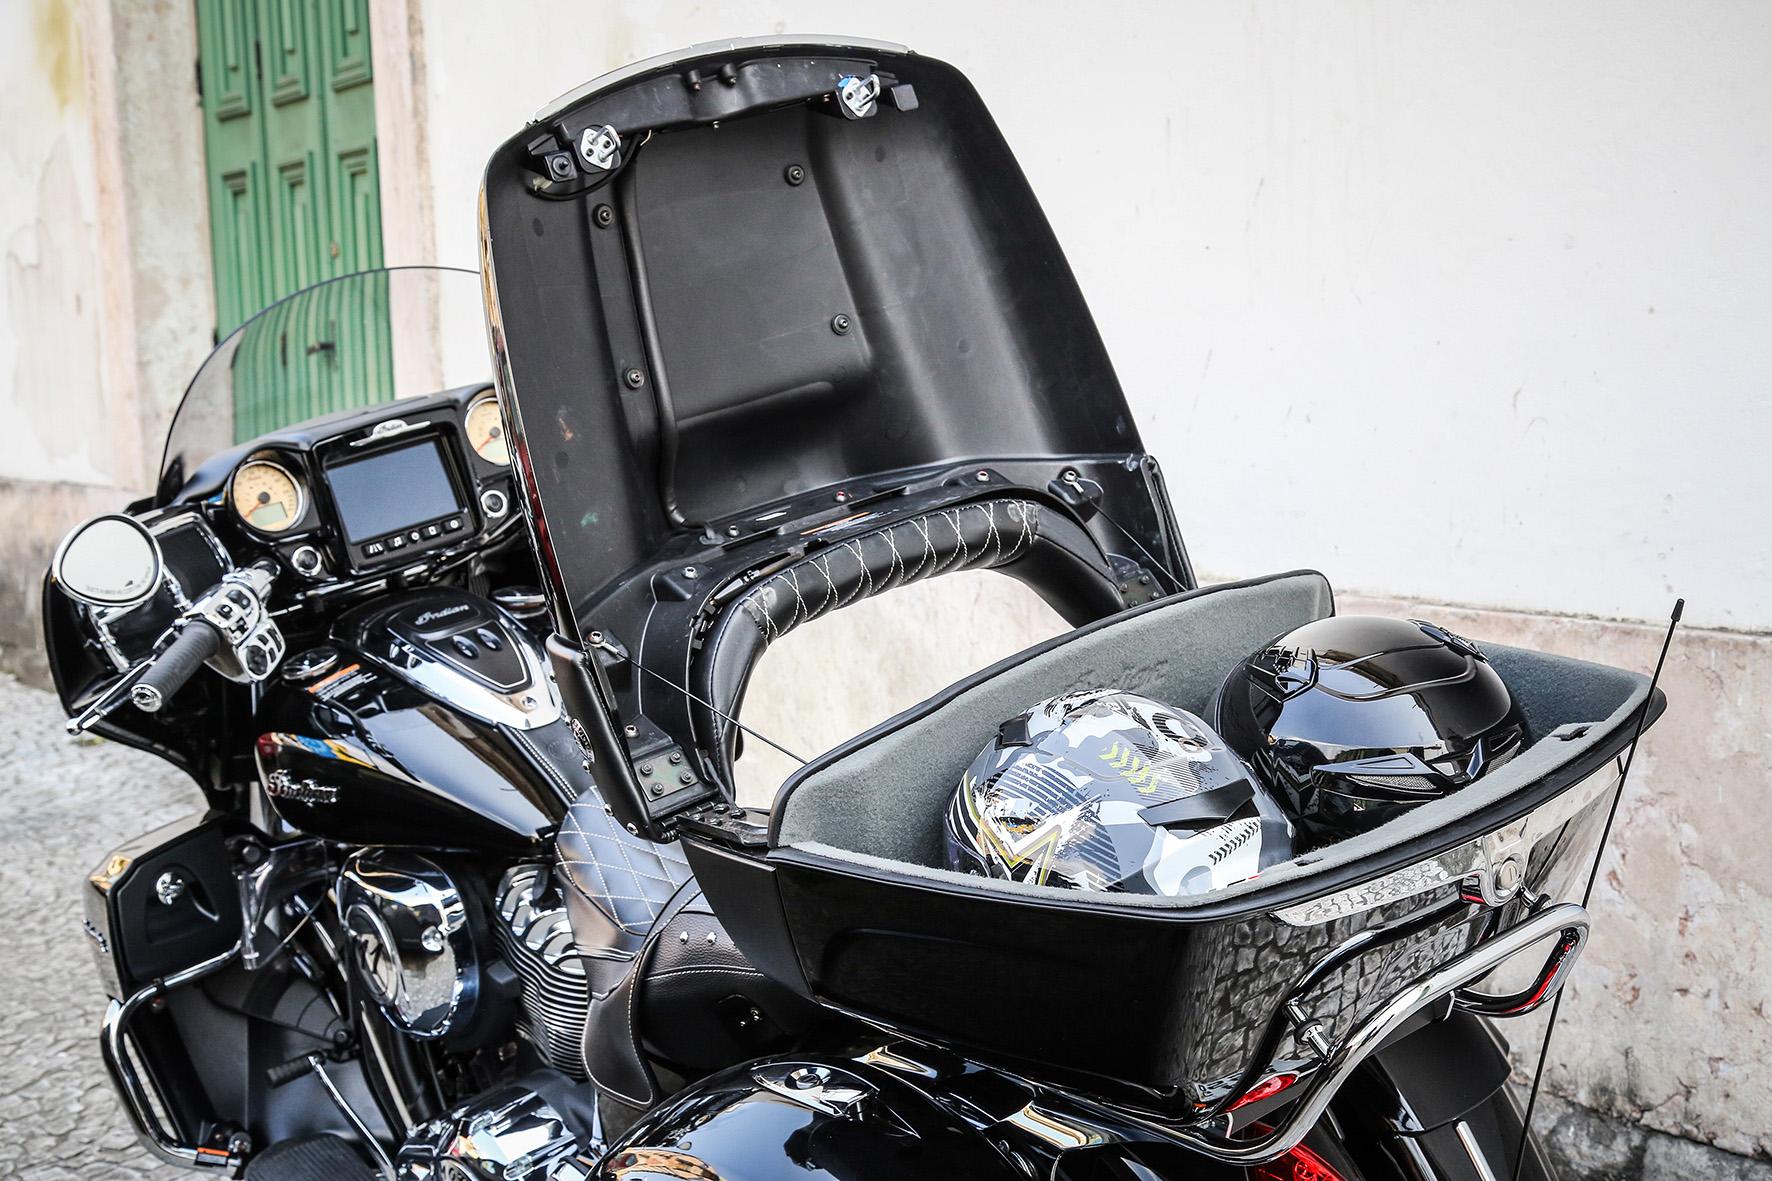 Indian Roadmaster Ridecommand